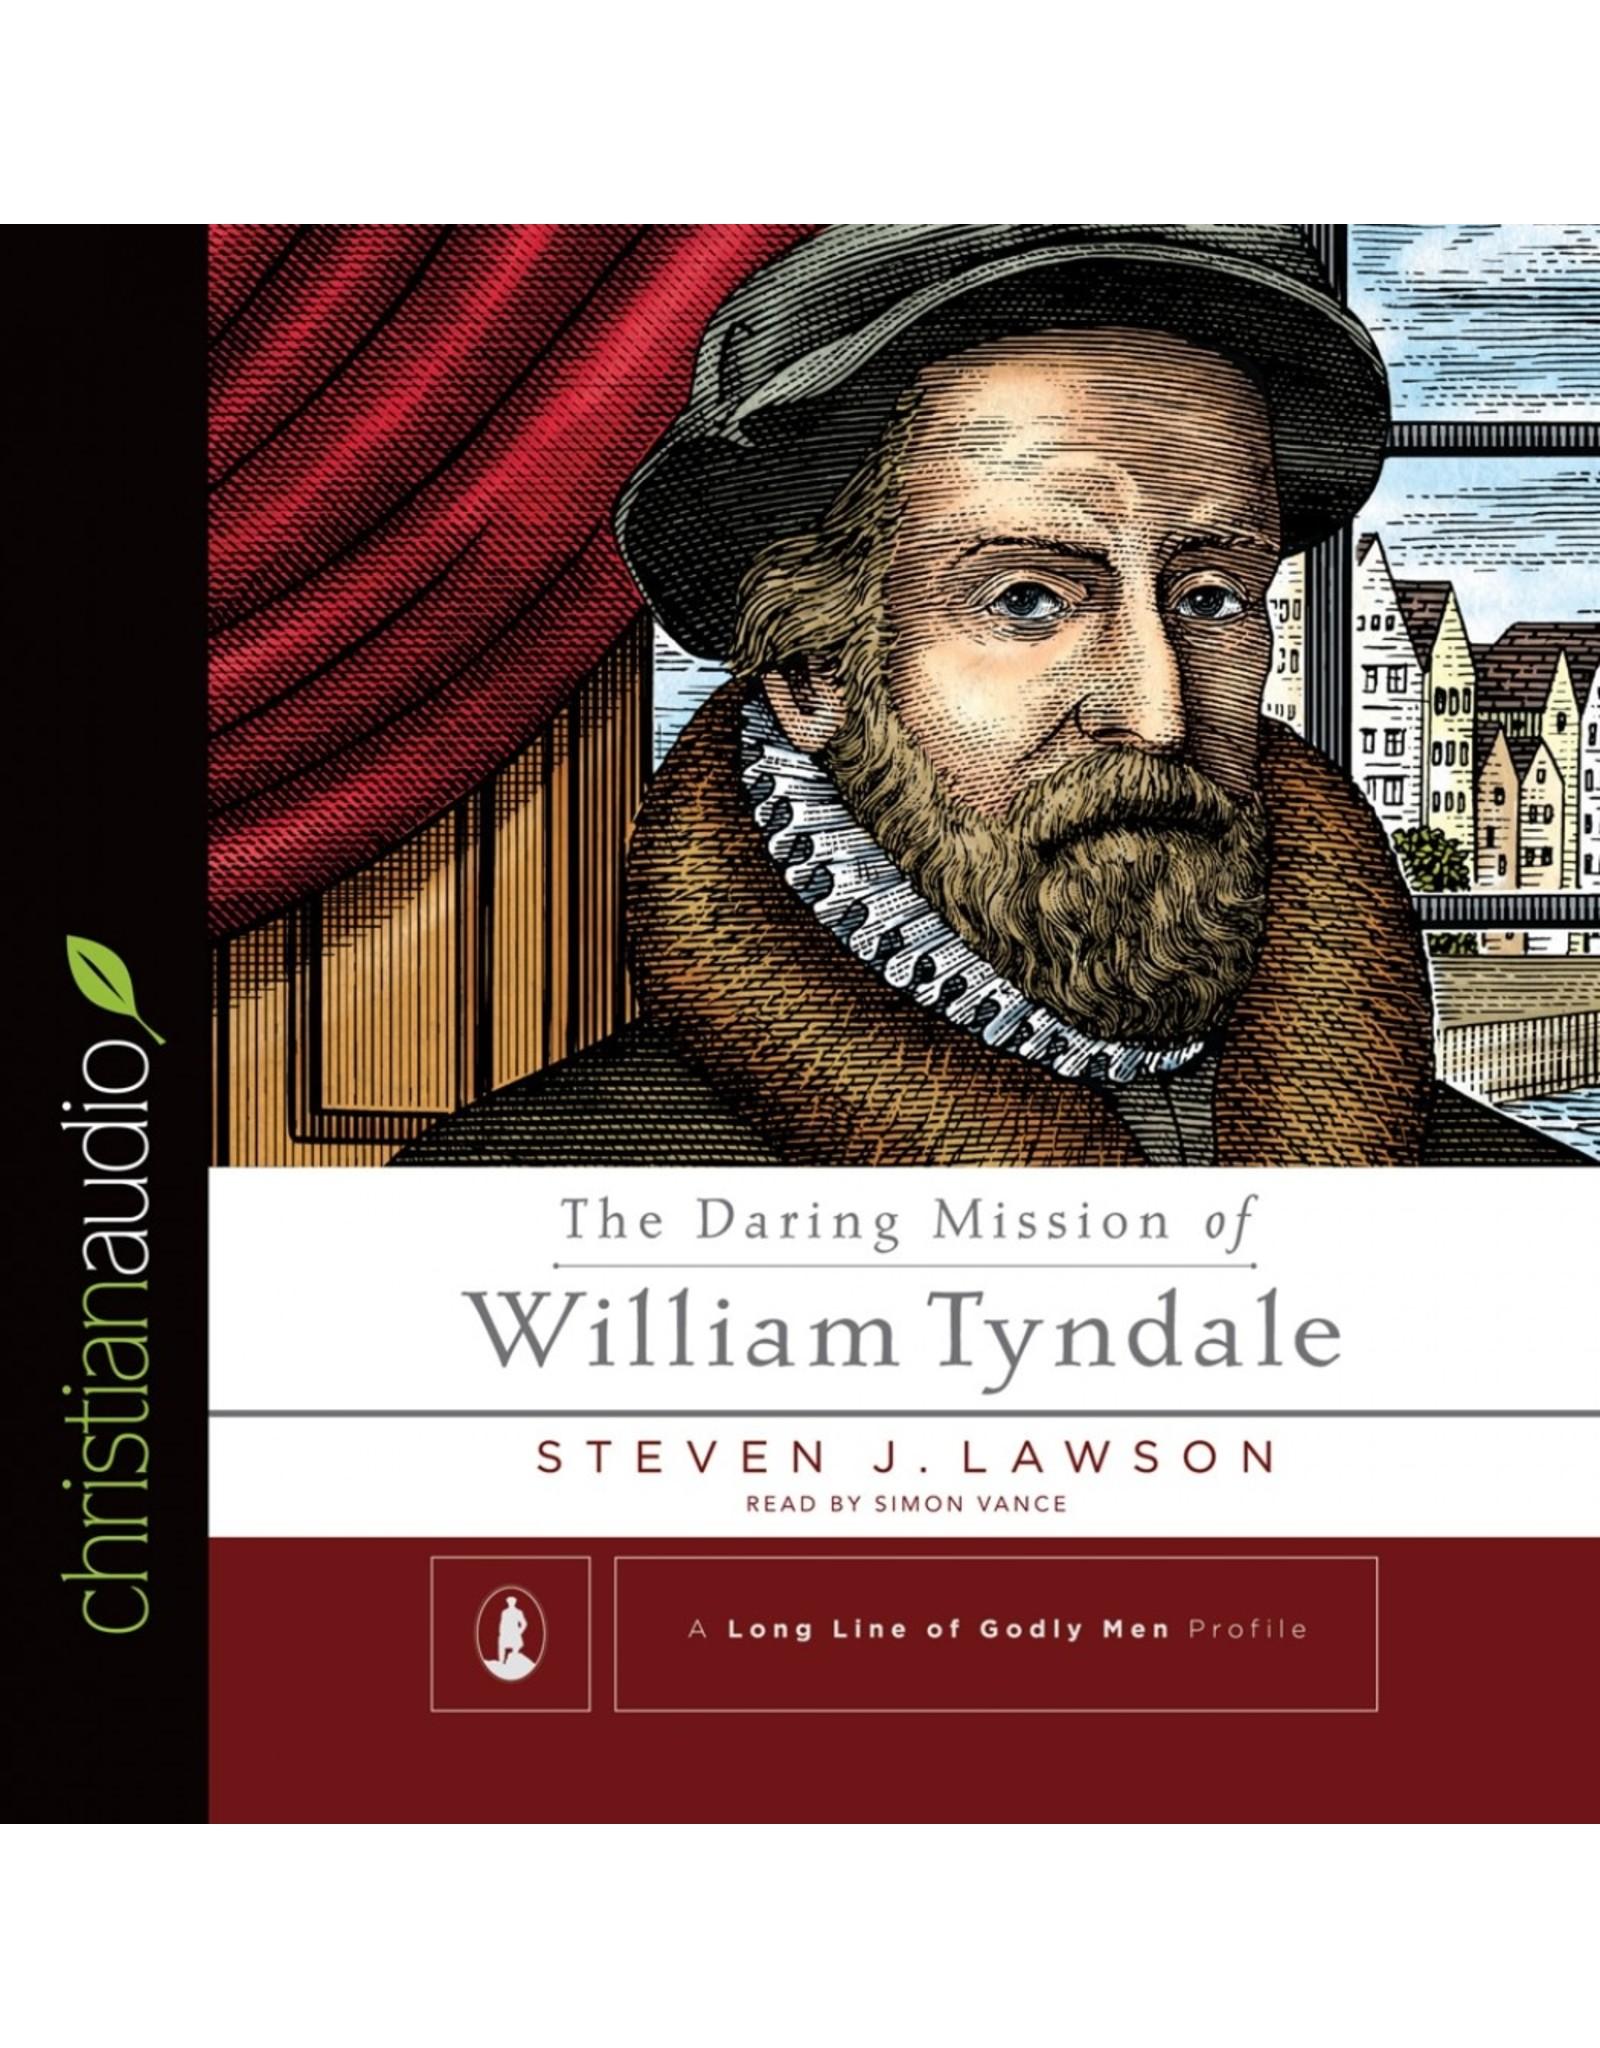 Daring Mission of William Tyndale (Audio CD)